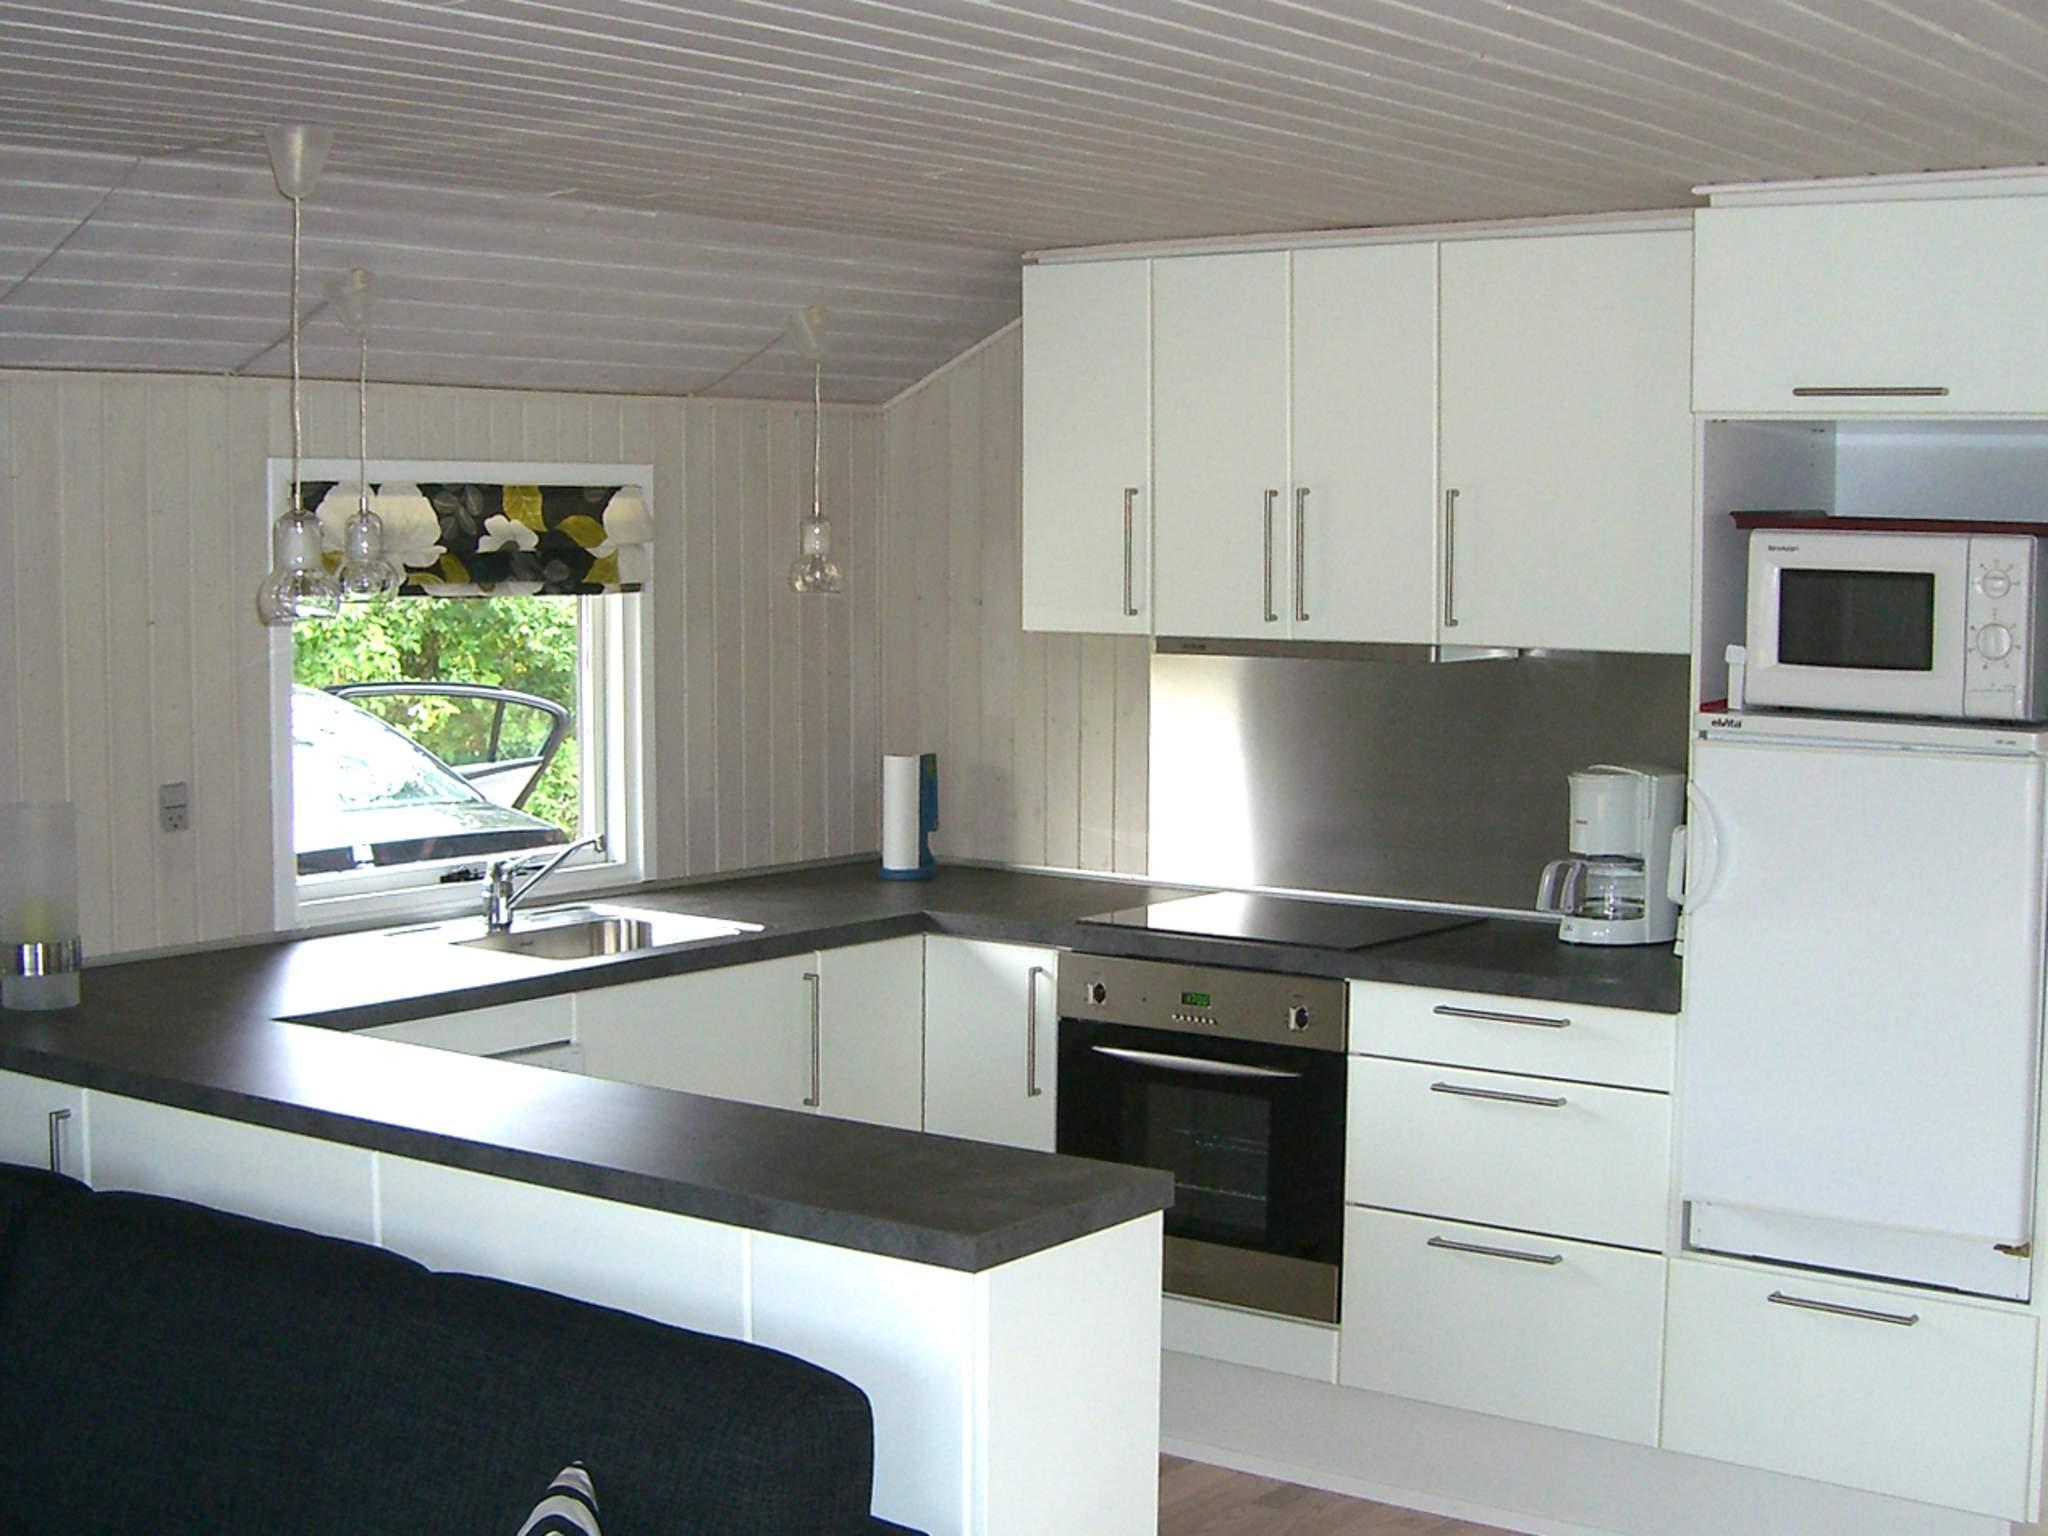 Maison de vacances Kramnitze (87258), Kramnitse, , Lolland, Danemark, image 3